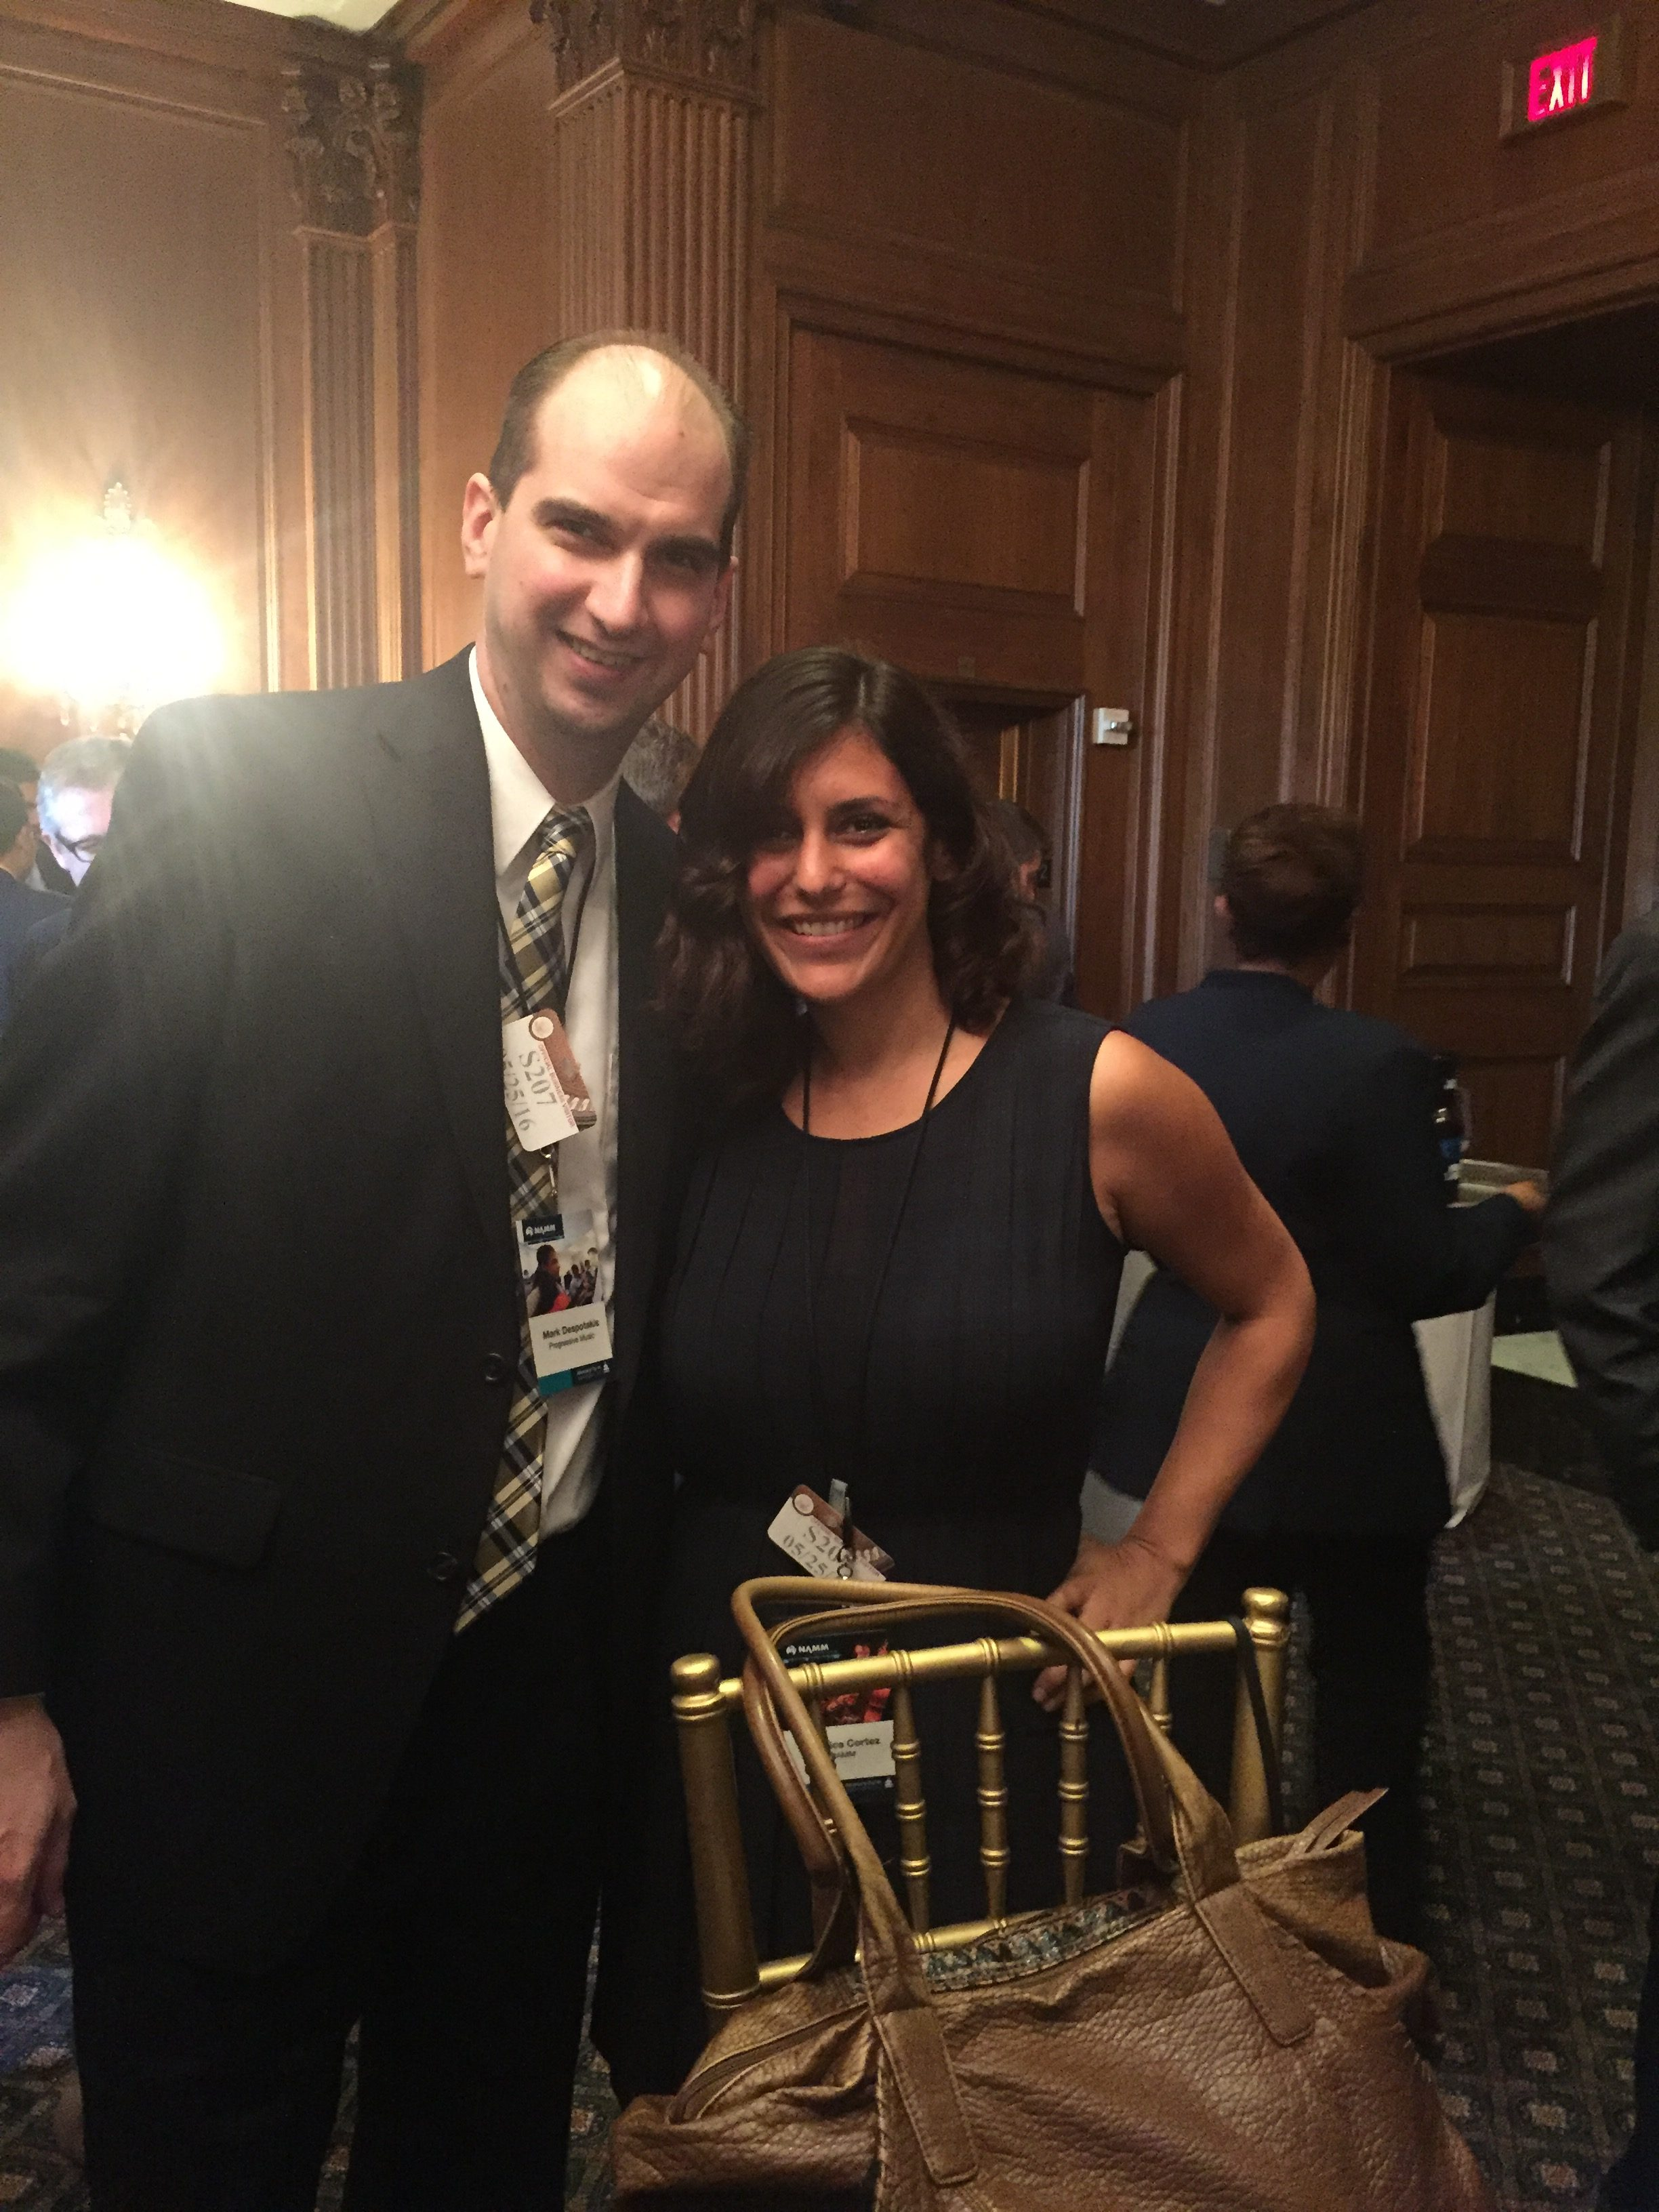 Progressive Music's Mark Despotakis with NAMM's Jessica Cortez at the Music Education Congressional Reception.